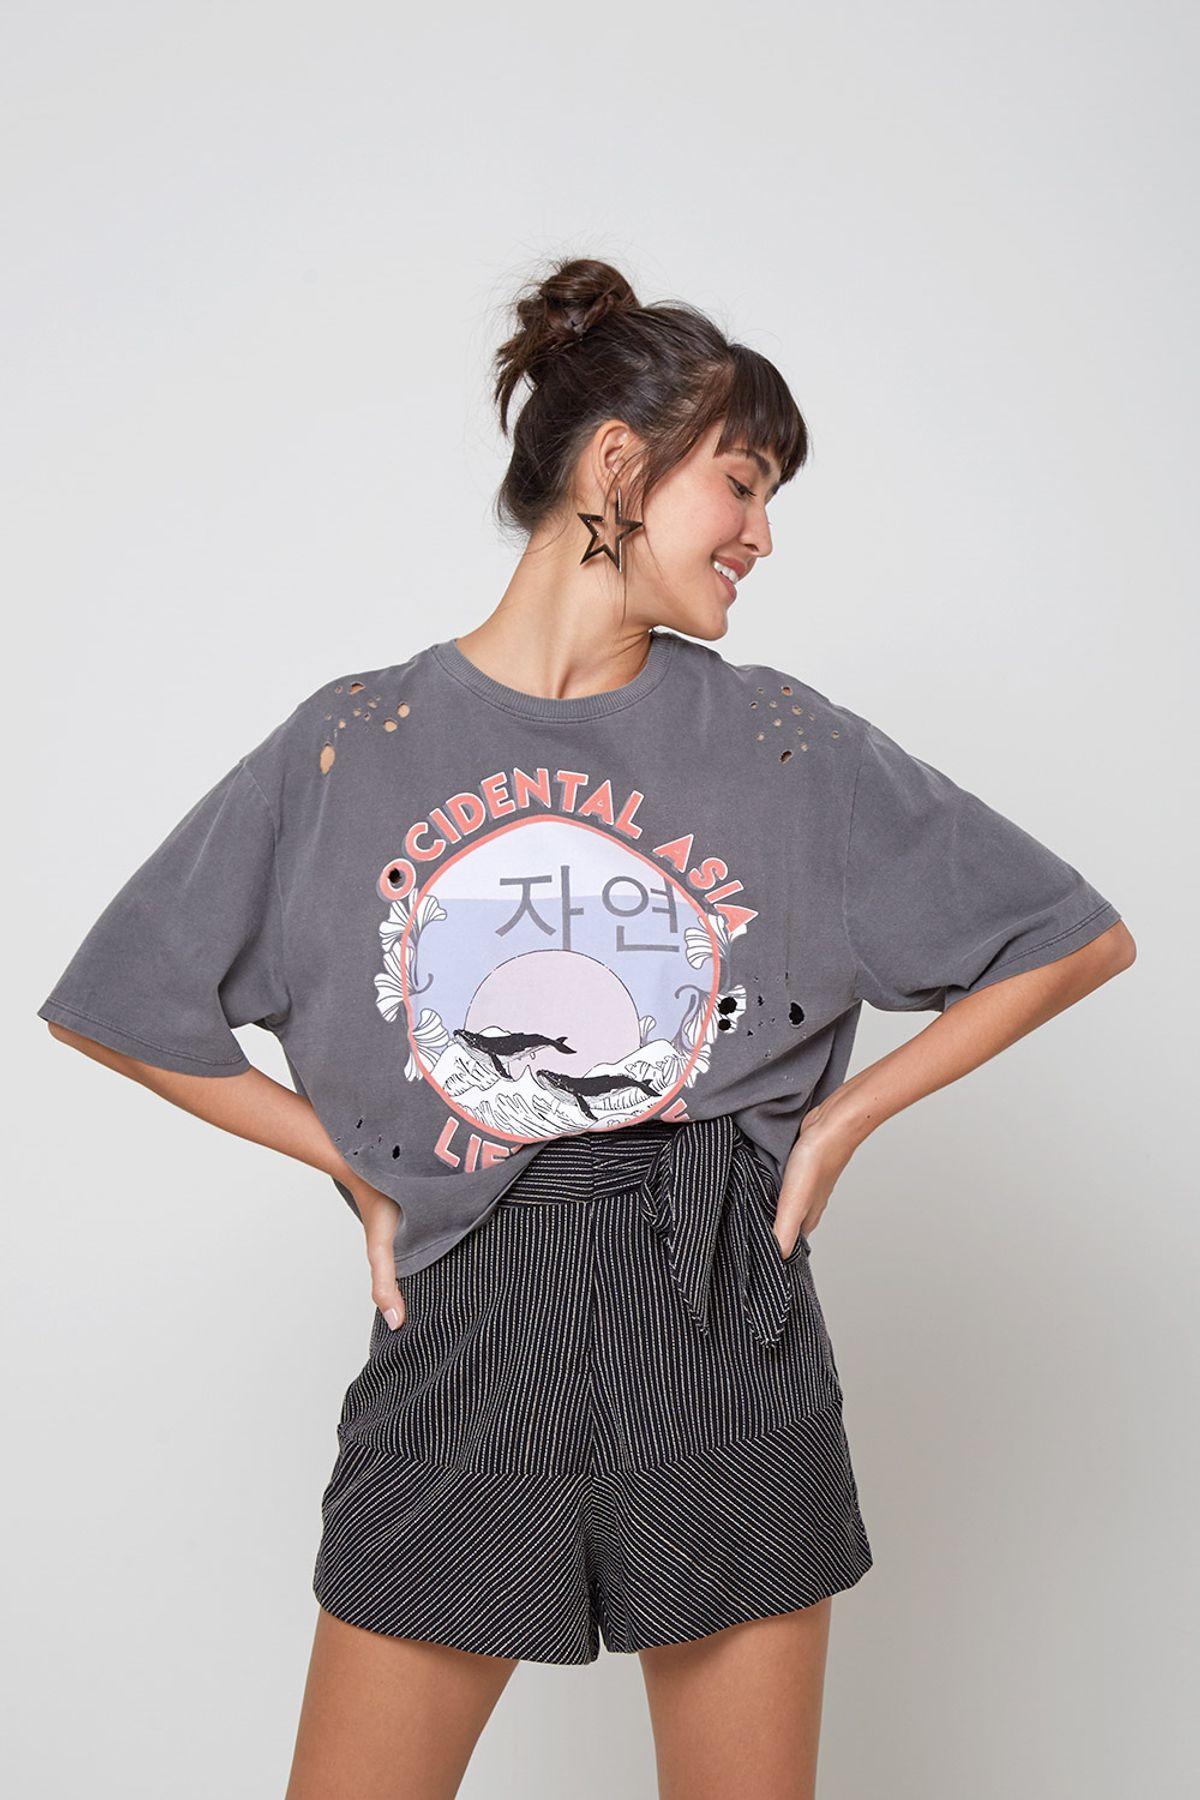 camiseta detonada estilo rock